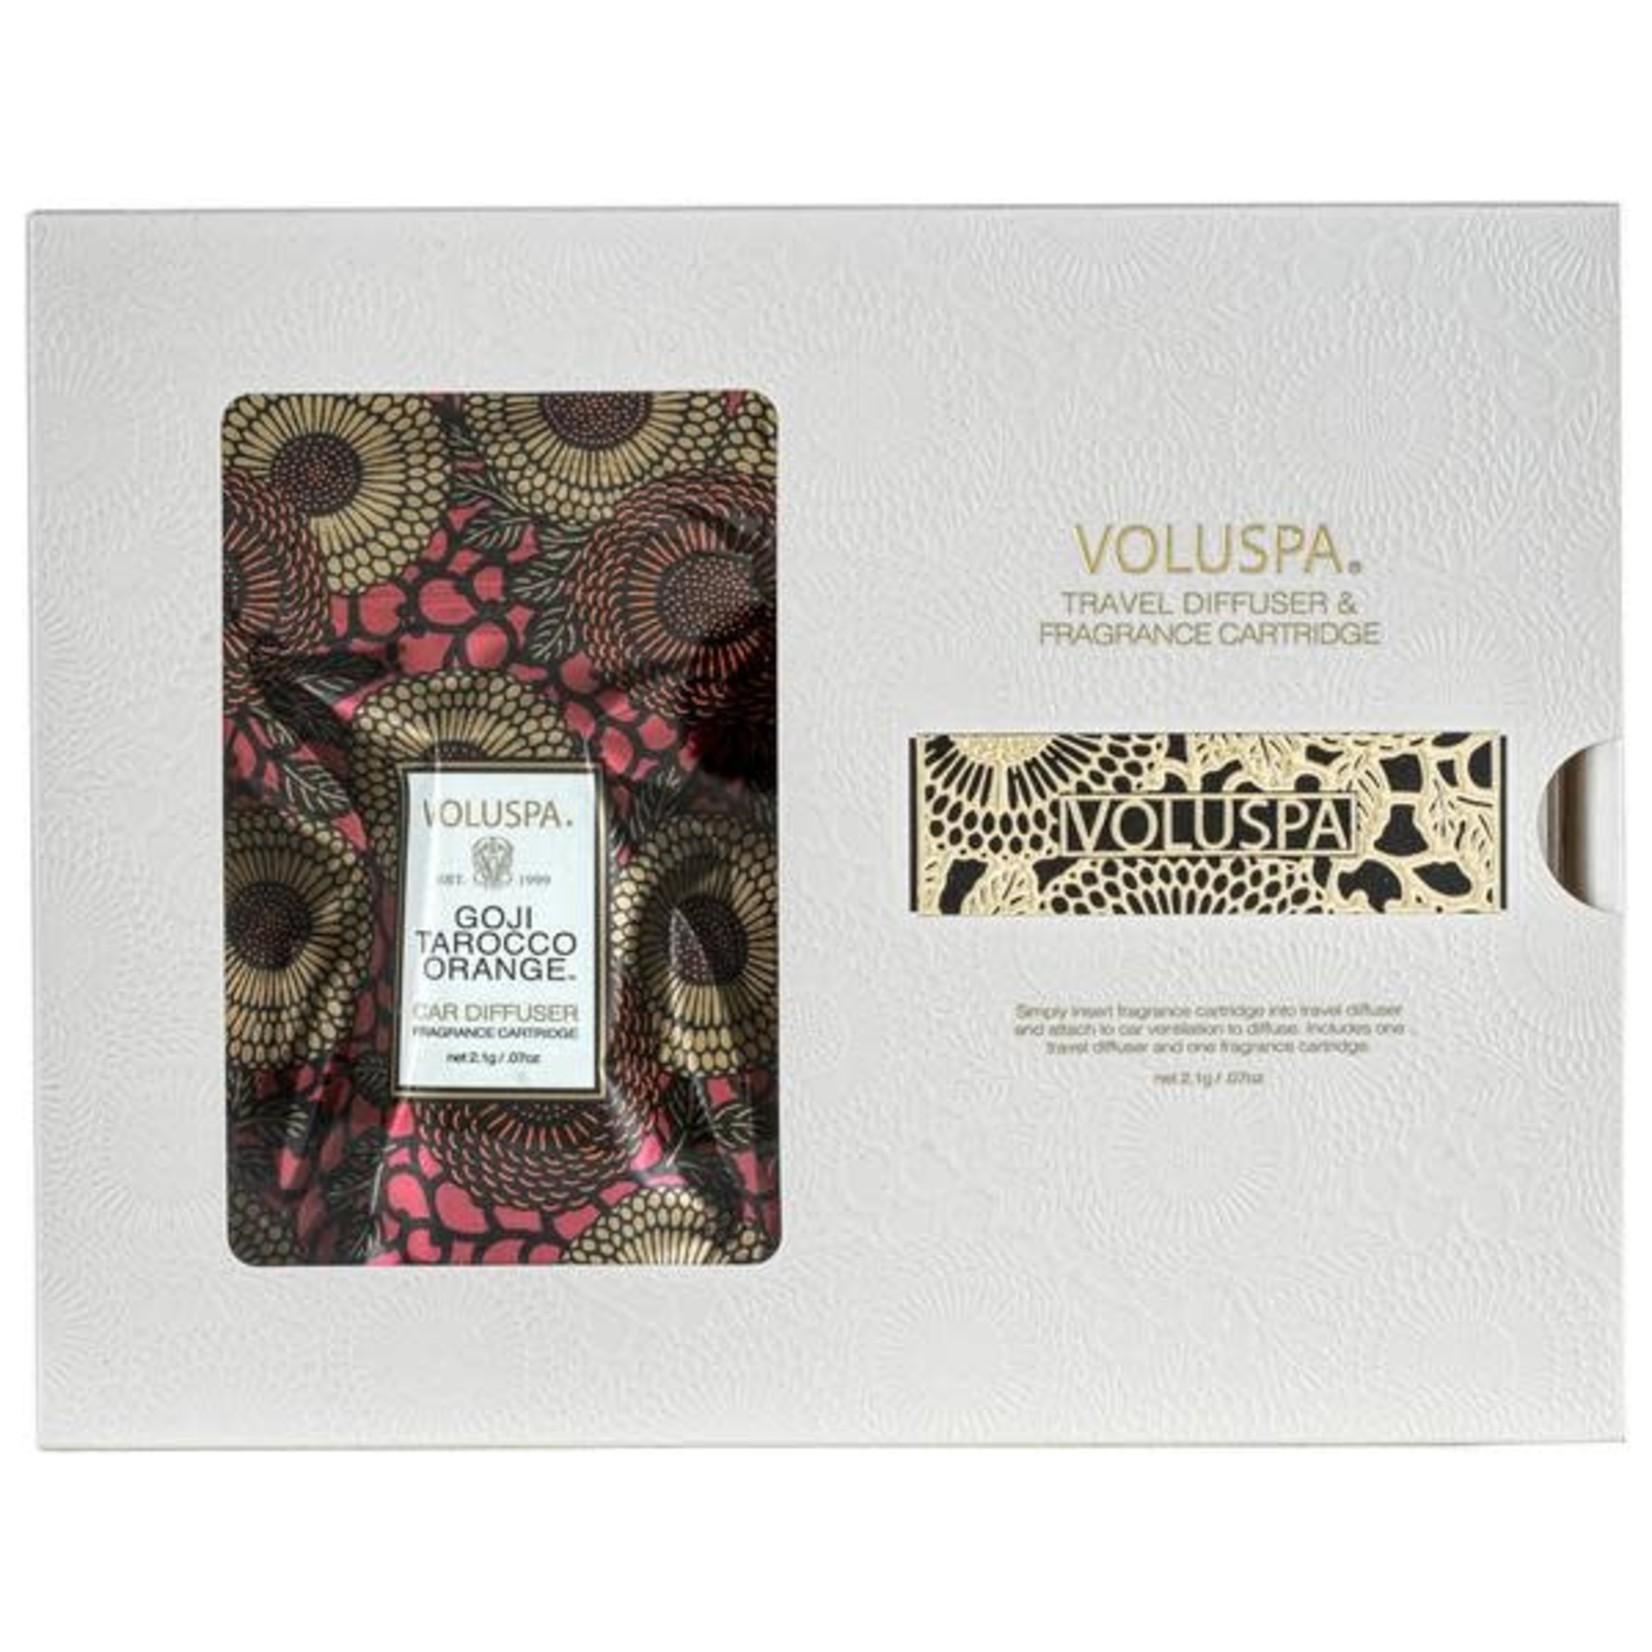 Voluspa Goji Tarocco Orange Travel Diffuser and Fragrance Cartridge